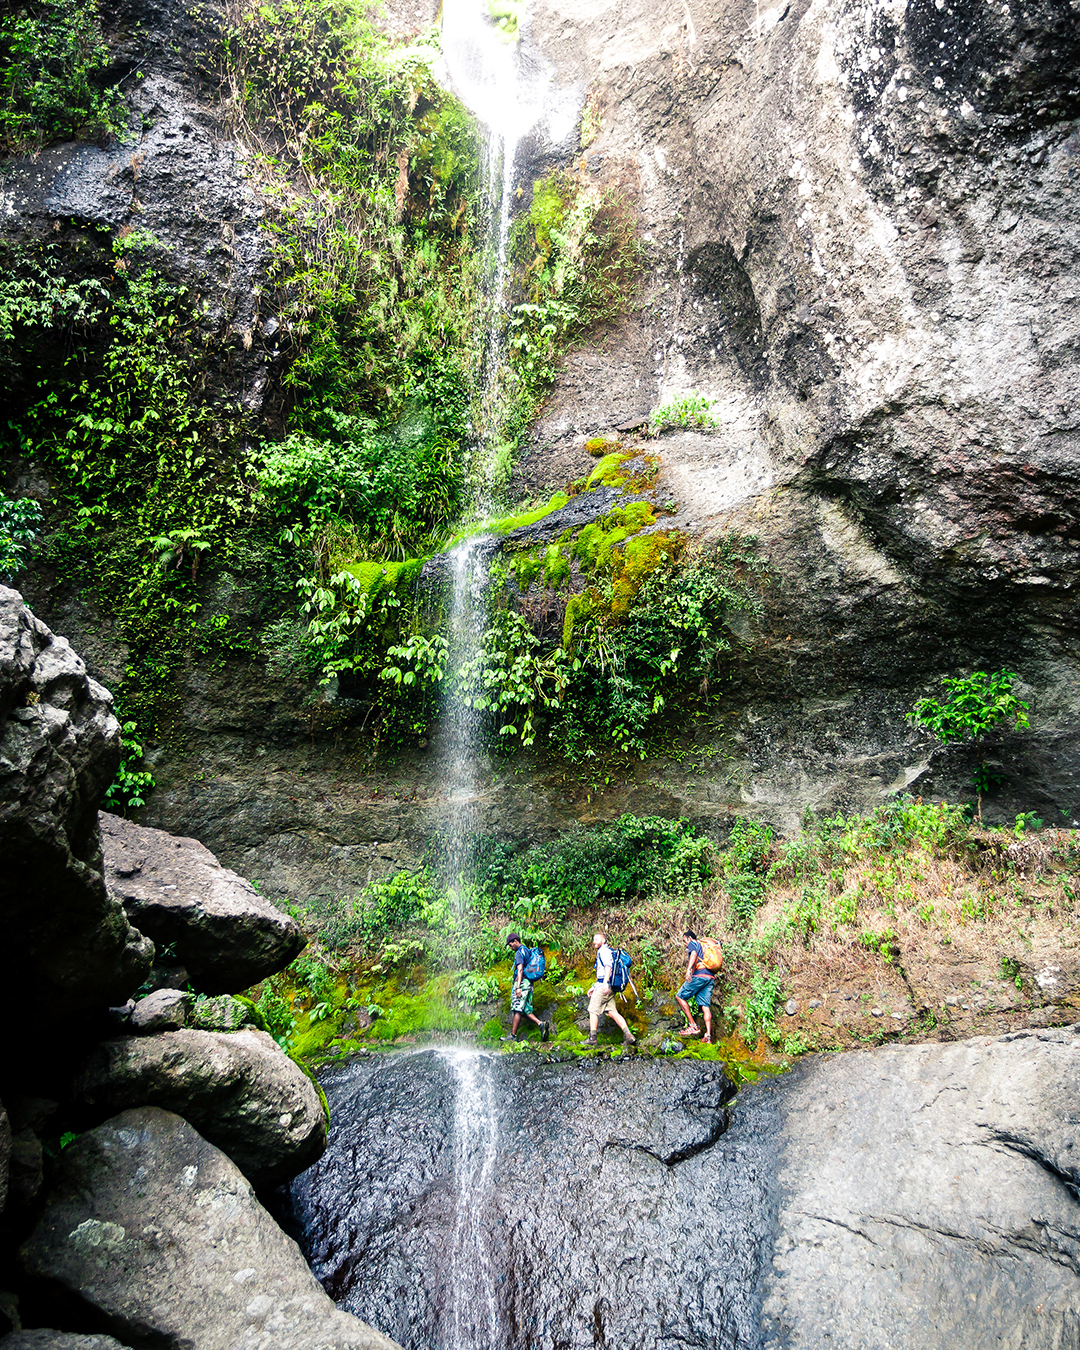 A group trekking past a waterfall in Koroyanitu National Park